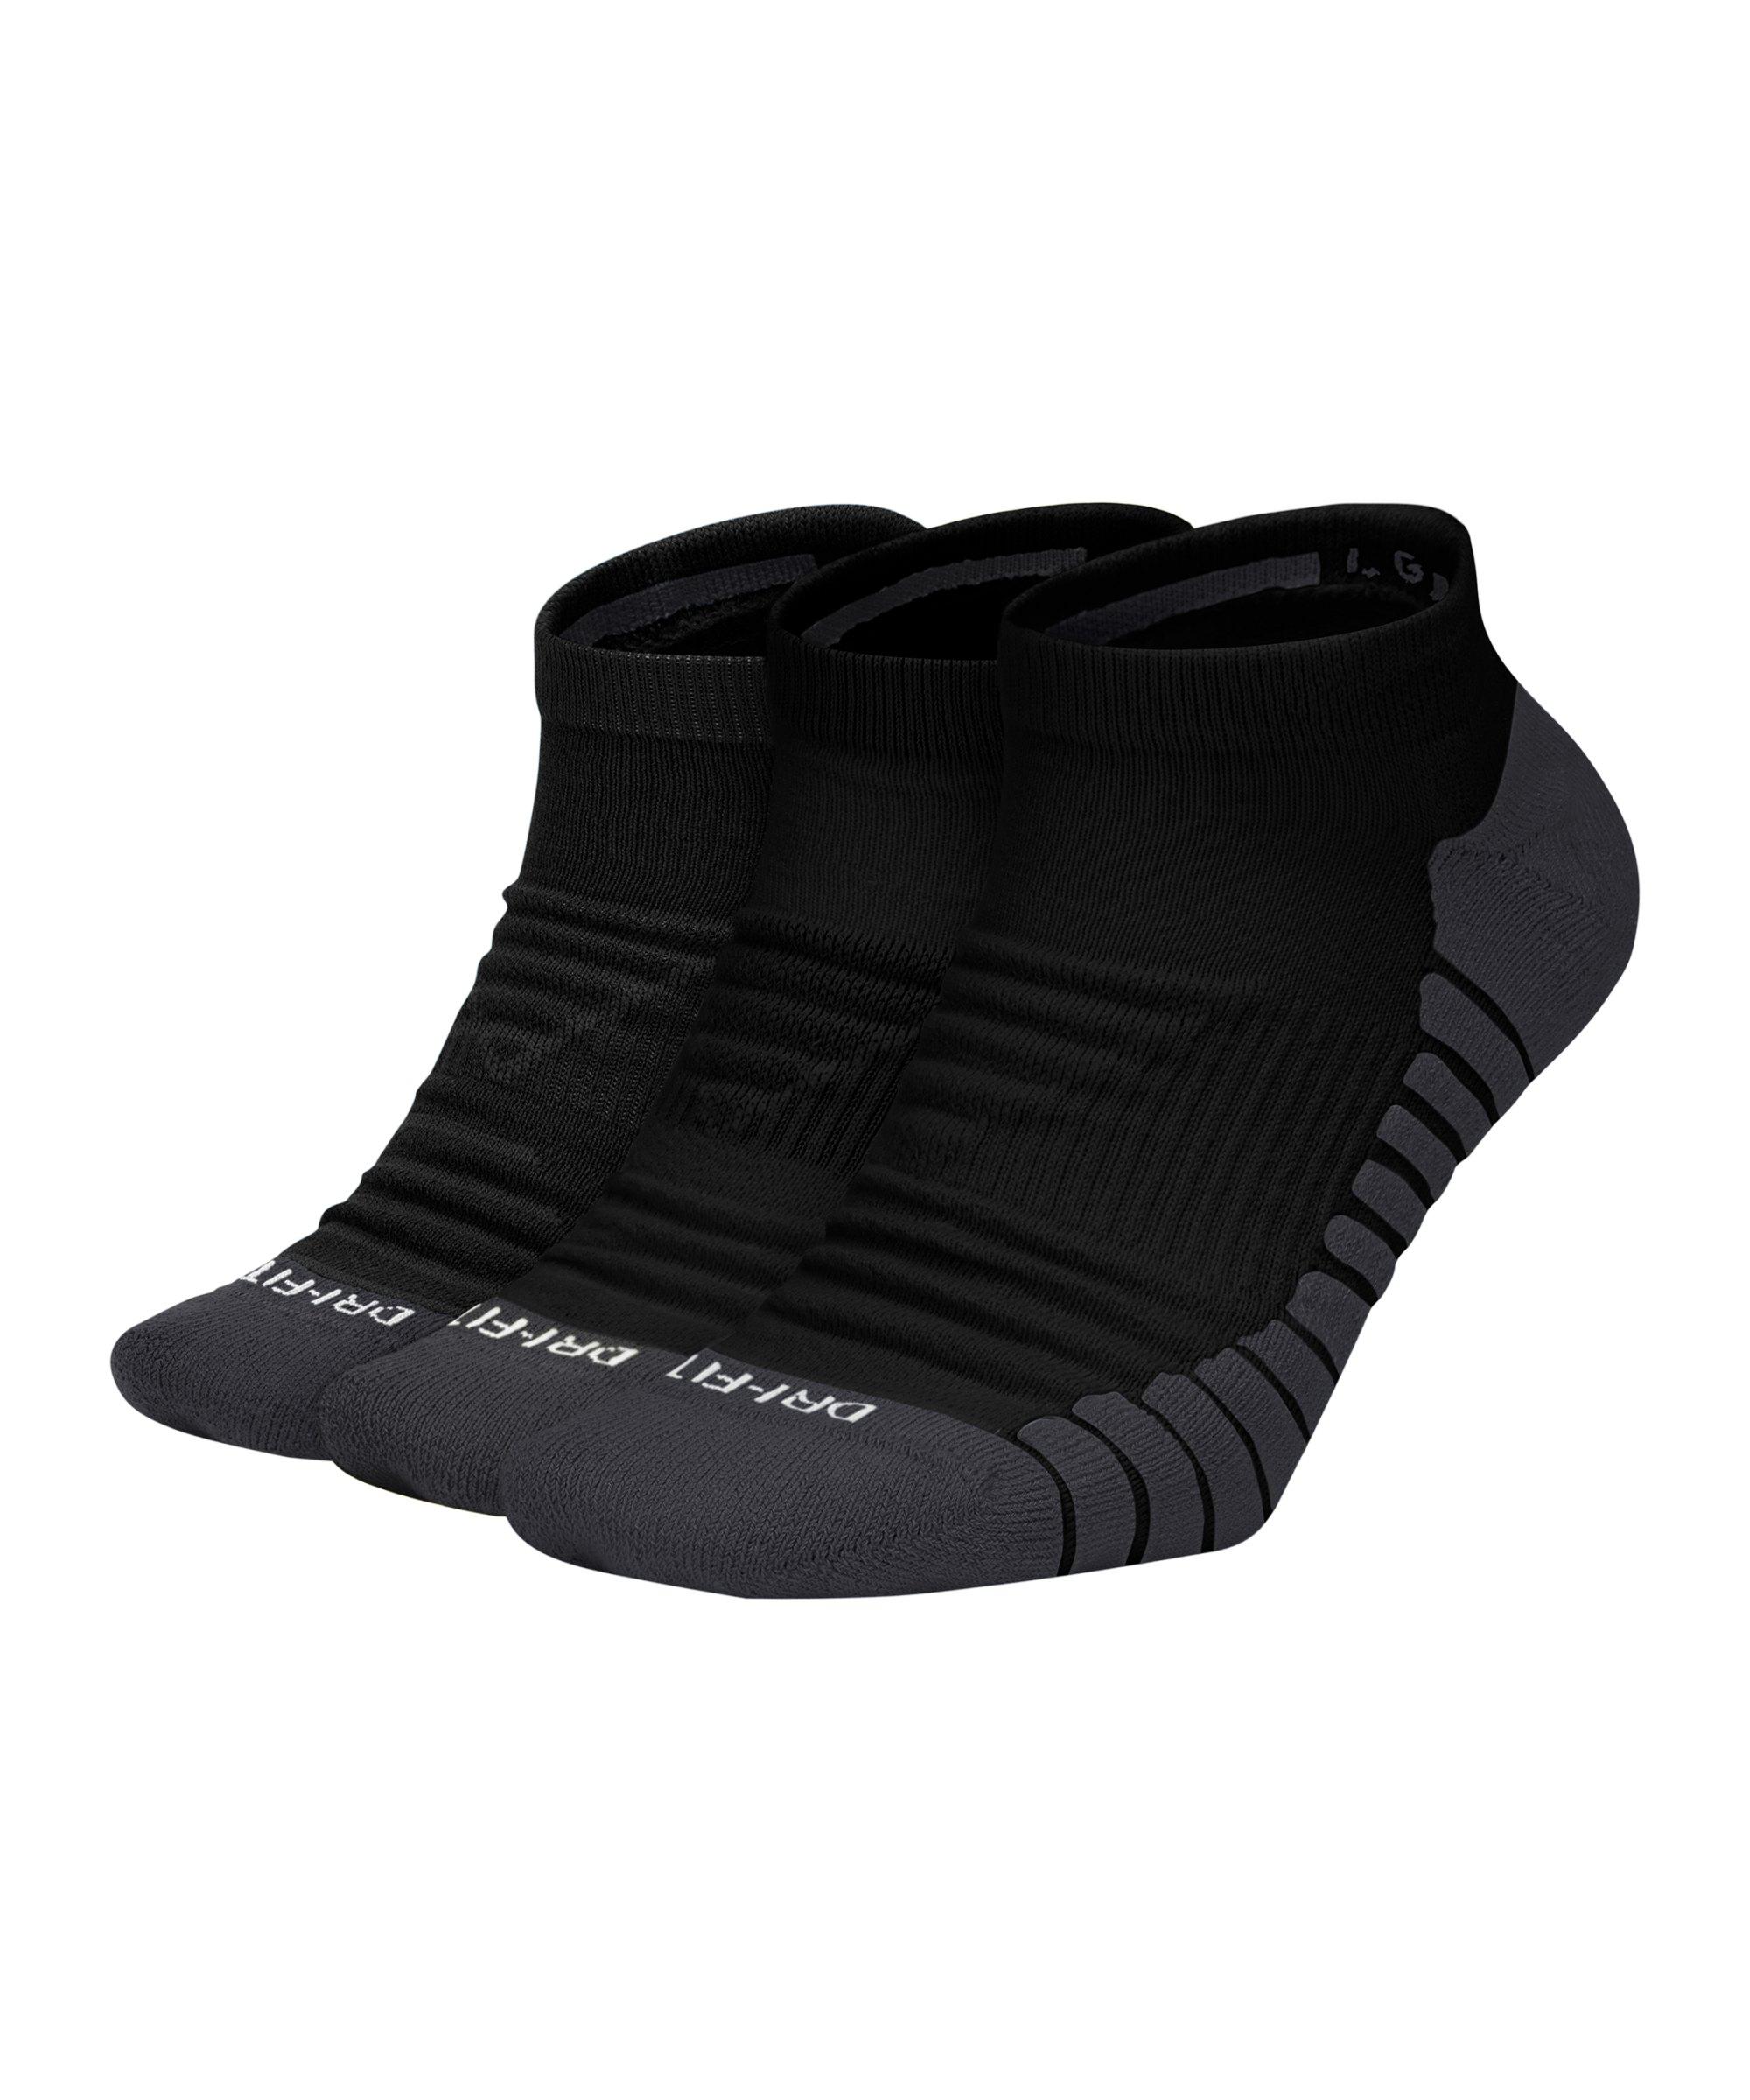 Nike Everyday No-Show Socken 3er Pack F010 - schwarz